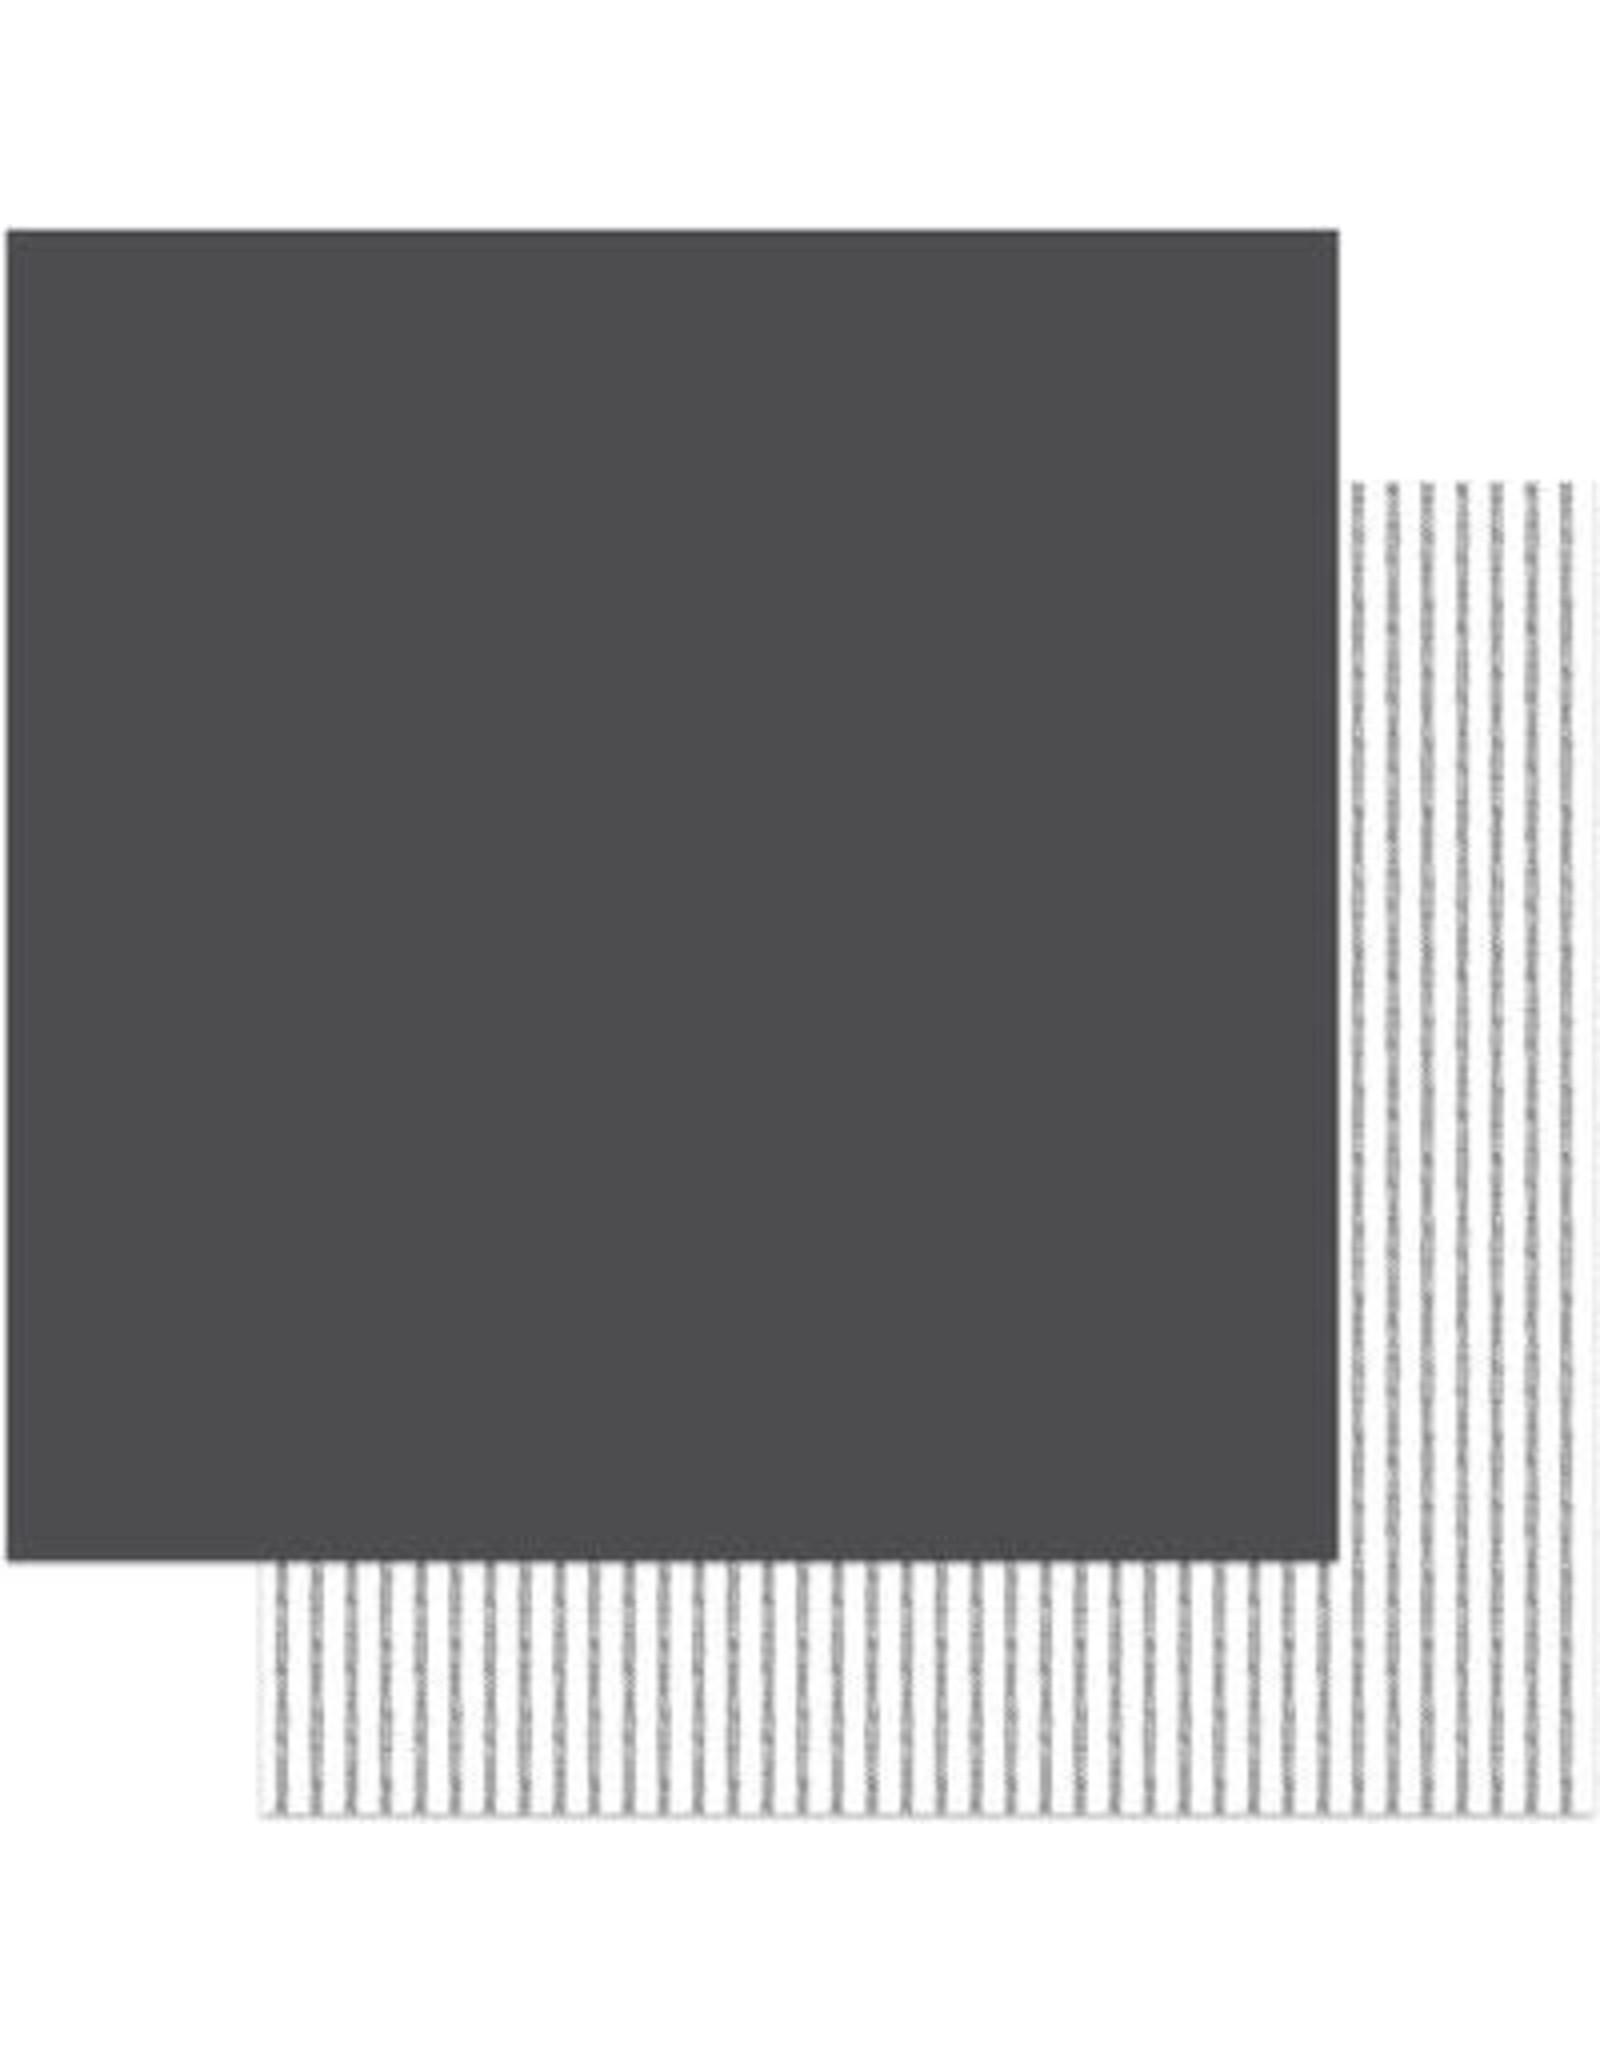 PHOTOPLAY 12X12 Solids+ Paper, Little One - Dark Grey